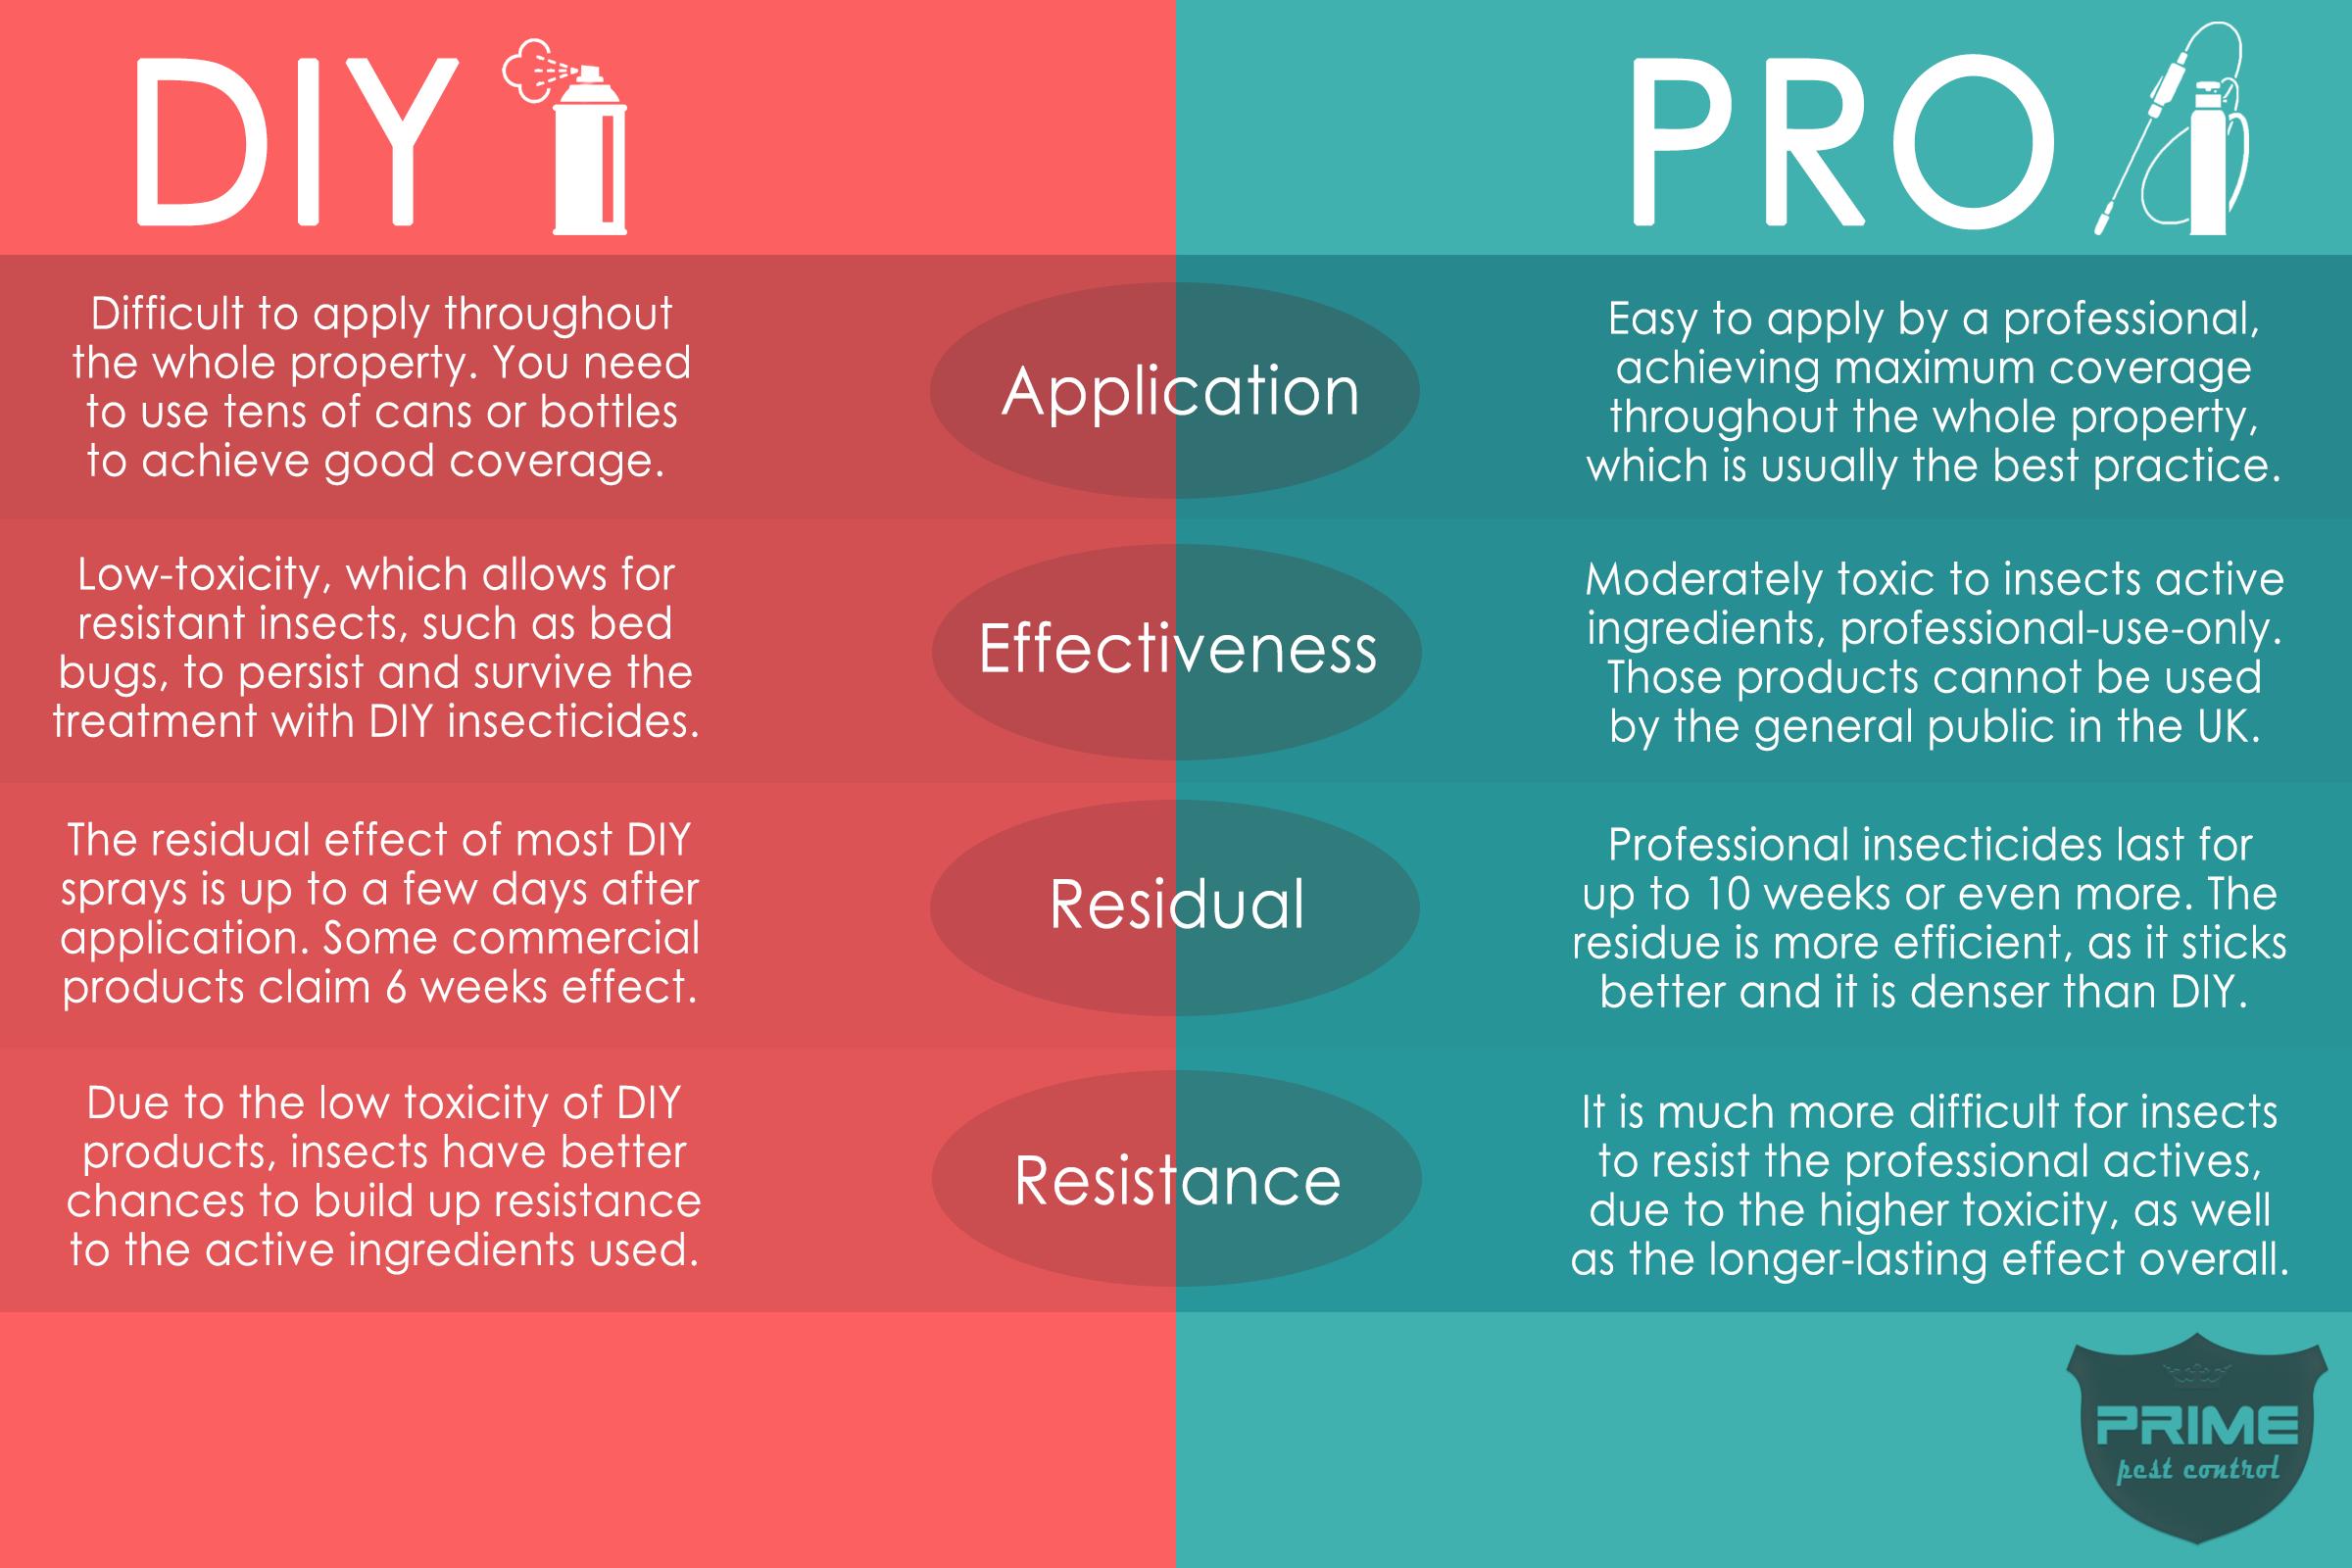 DIY-vs-PRO-spray